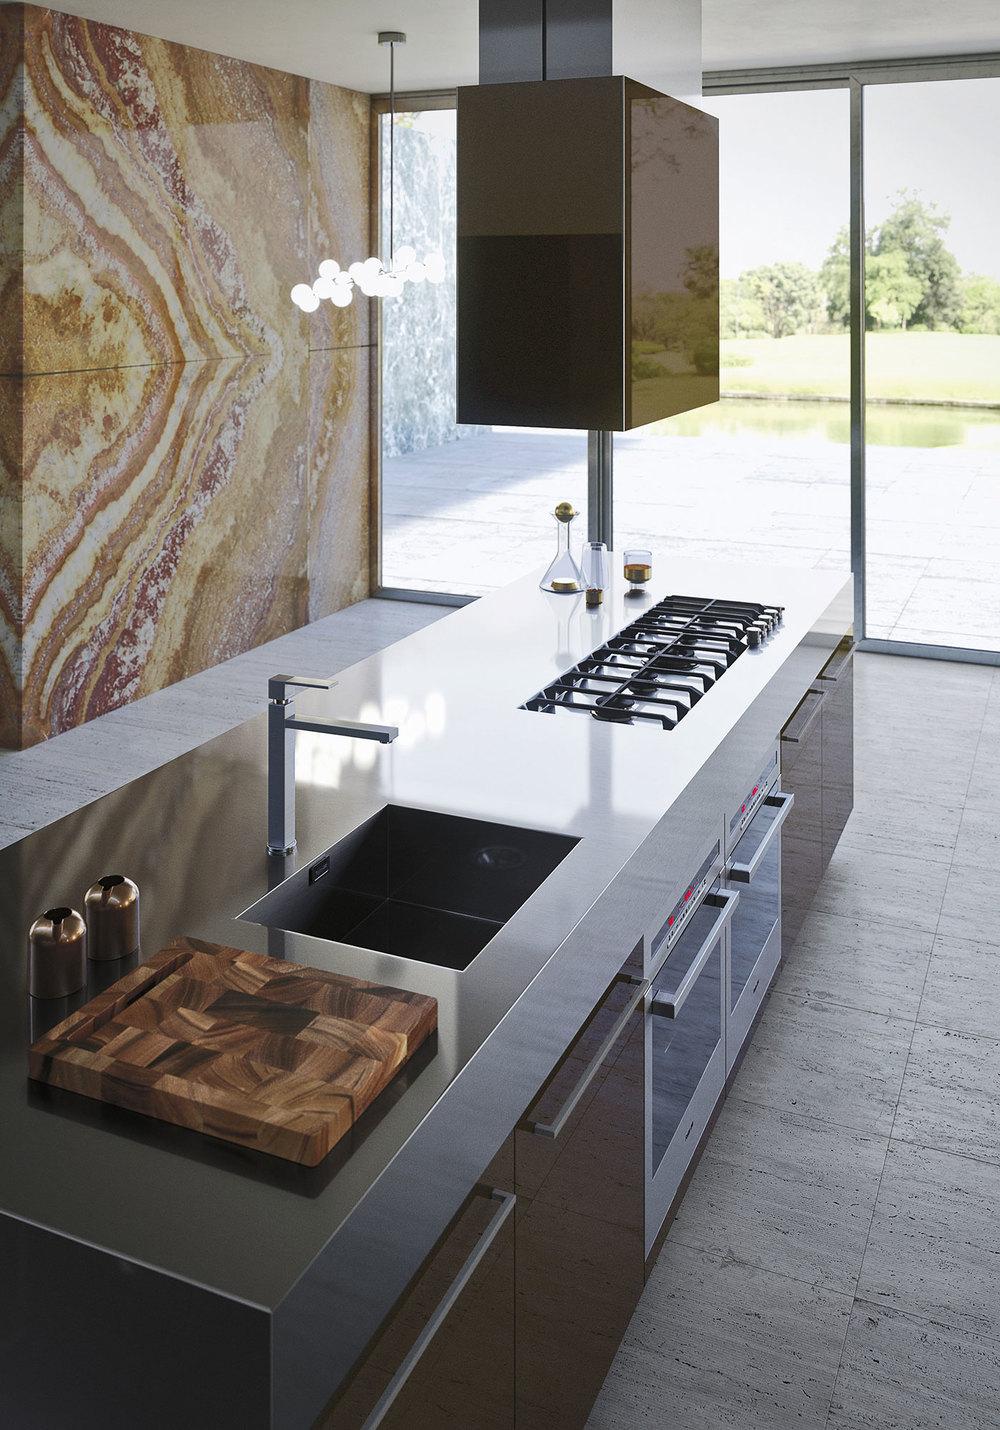 cucina-dettaglio-Opera-absolute-brown-3.jpg